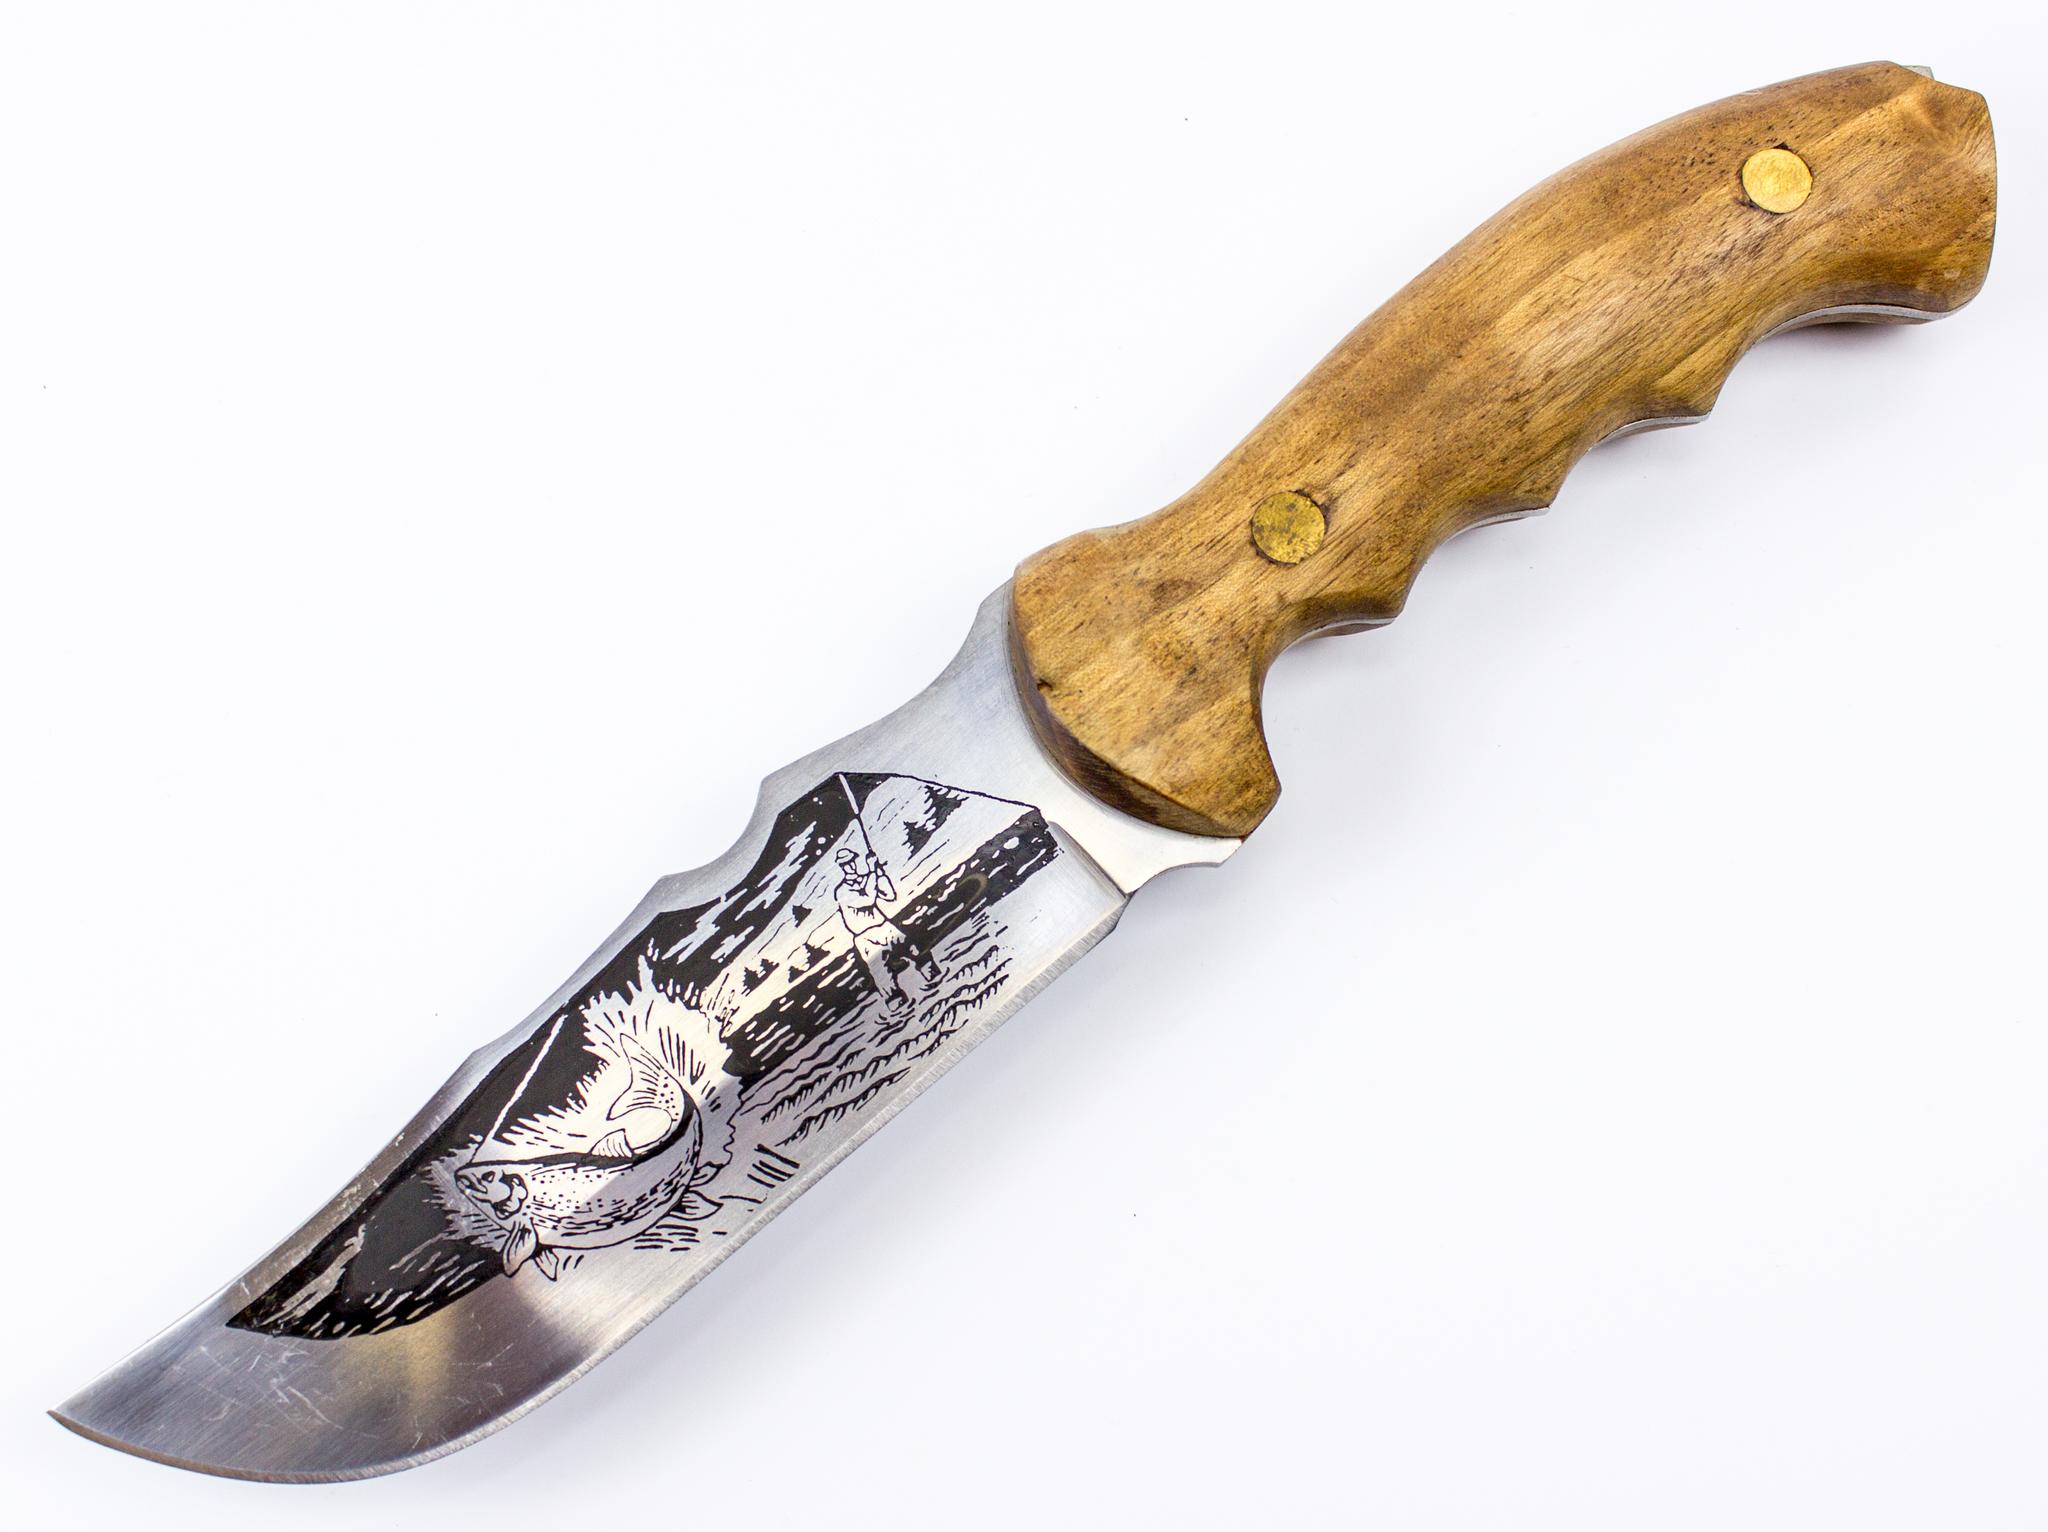 Нож Каспий, КизлярНожи Кизляр<br>Нож Каспий, Кизляр<br>